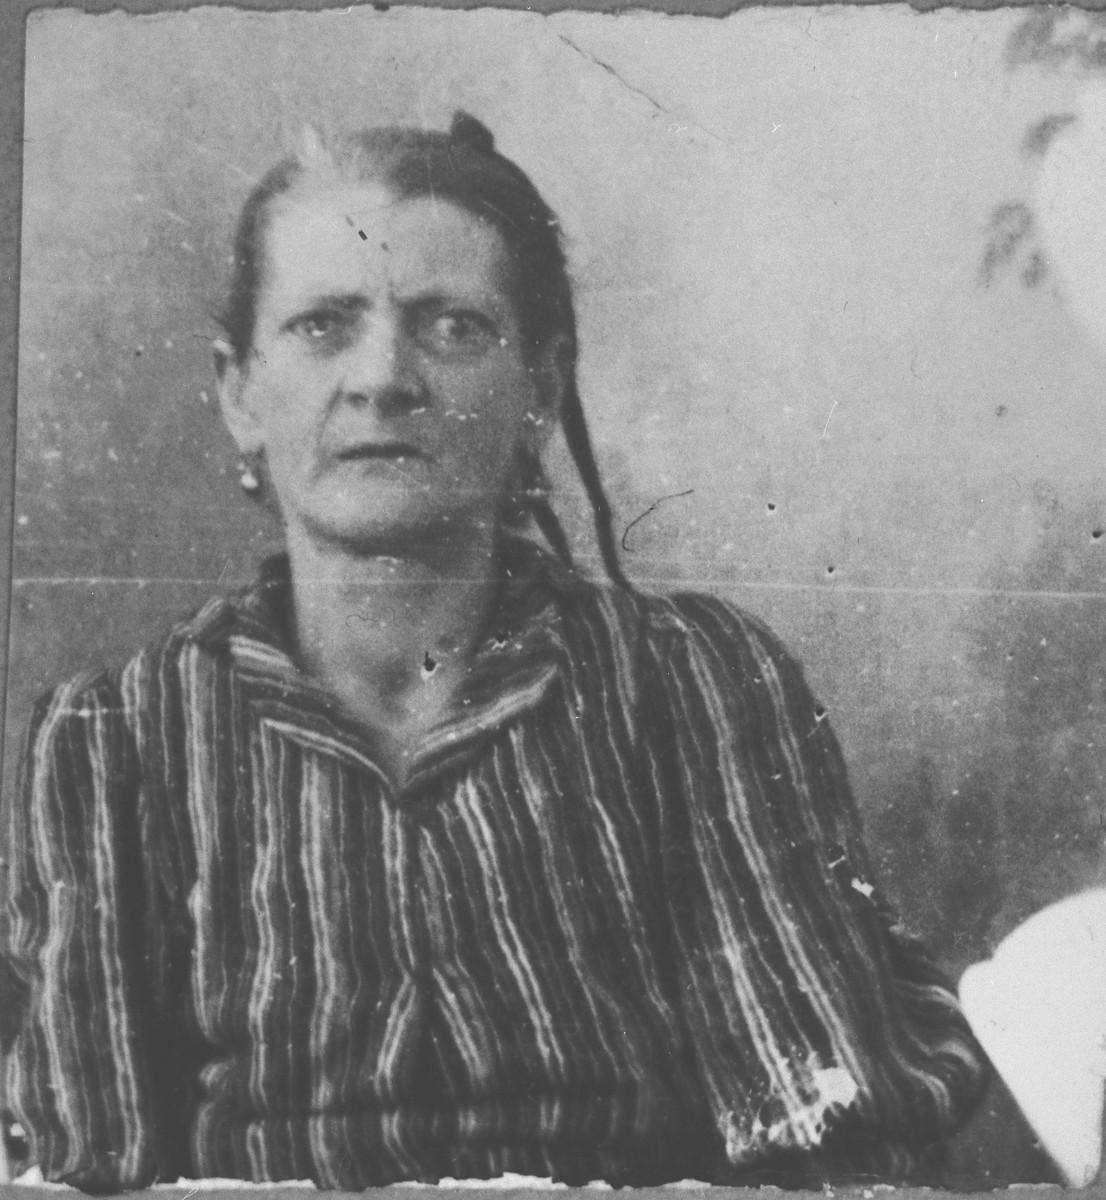 Portrait of Bohora Eschkenasi, wife of Solomon Eschkenasi.  She was a laundress.  She lived at Krstitsa 15 in Bitola.